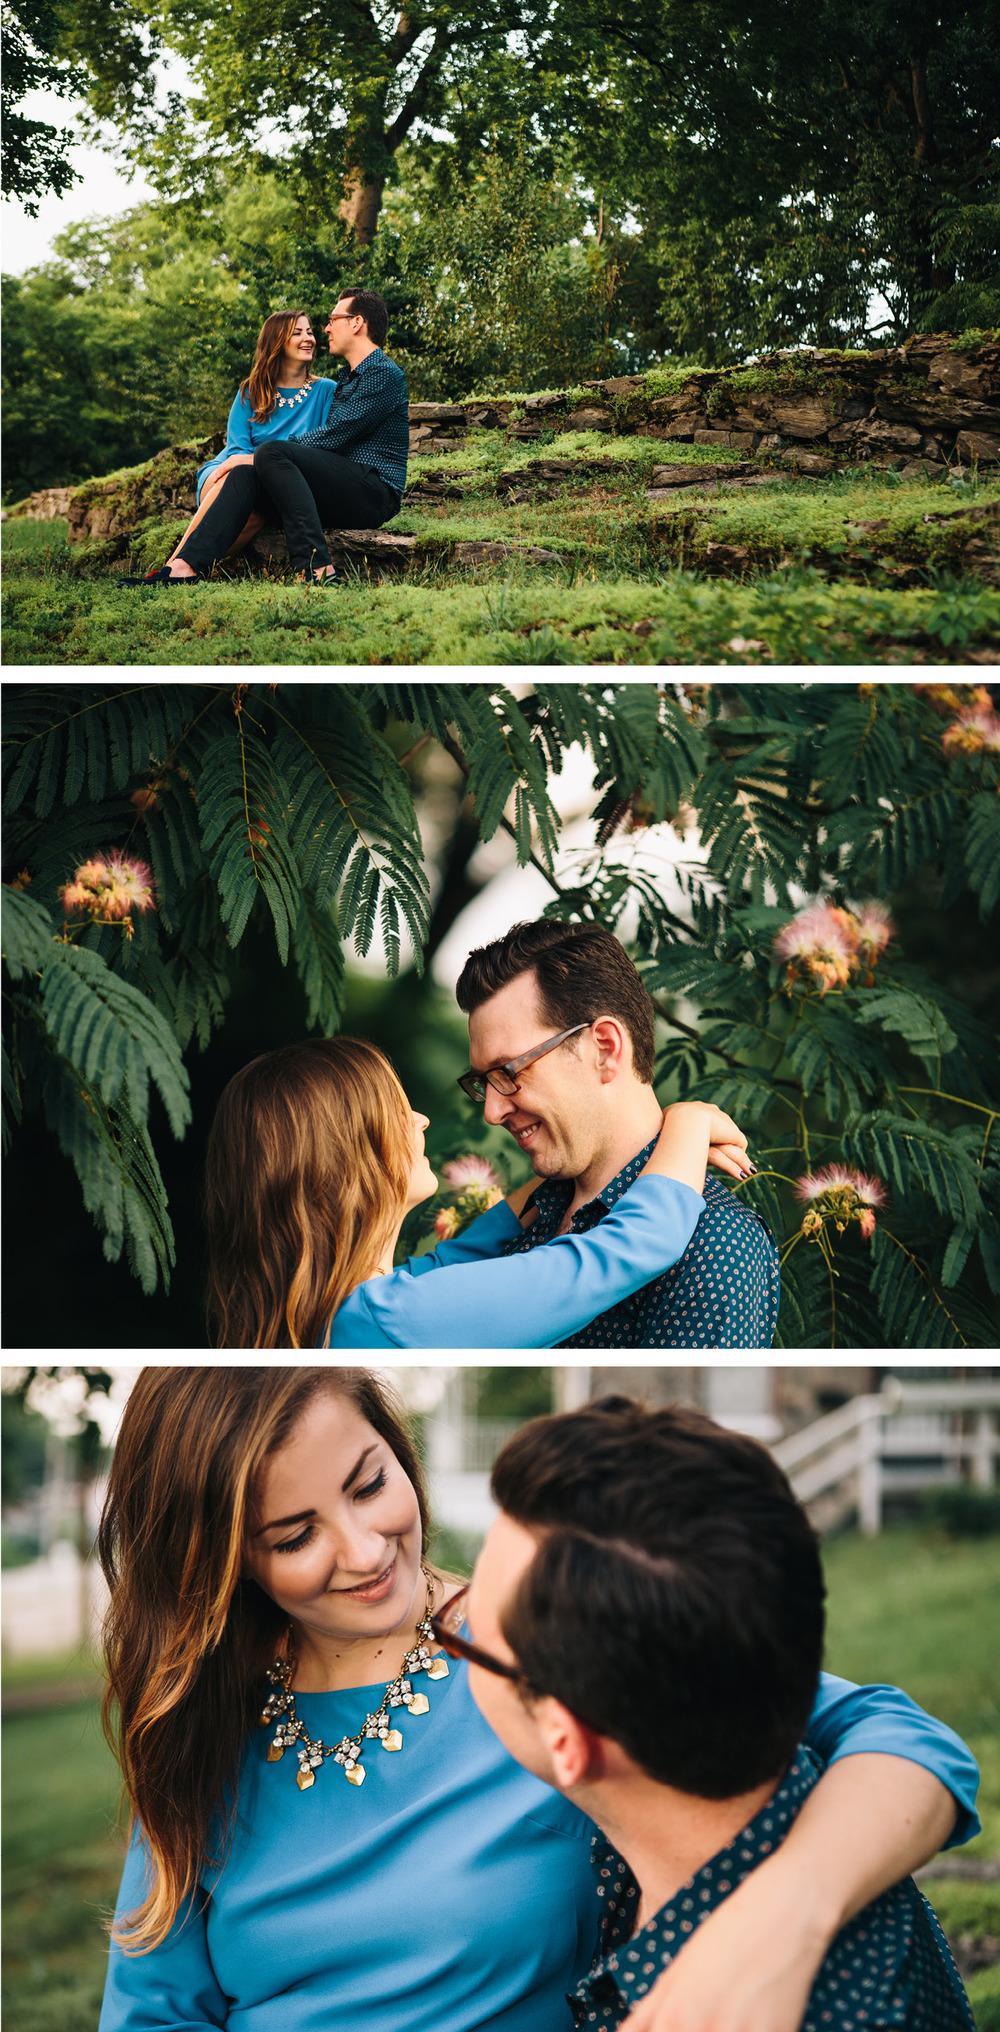 CK-Photo-Nashville-Wedding-Photographer-DL6.jpg